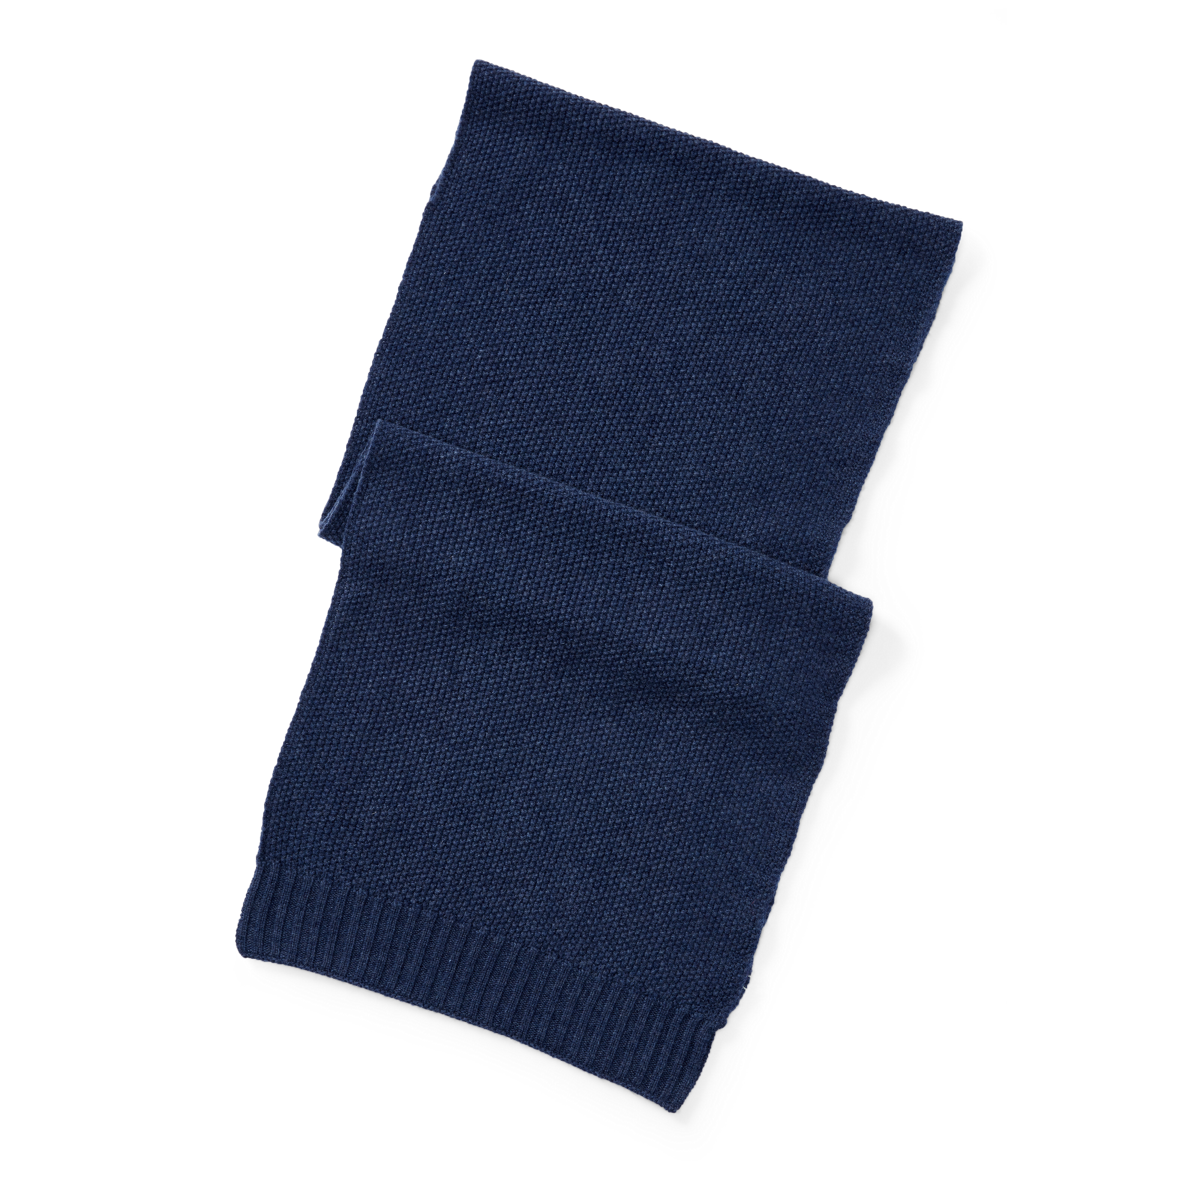 2c62bd7f86 Seed-Stitched Cashmere Scarf | Scarves Hats, Scarves & Gloves ...